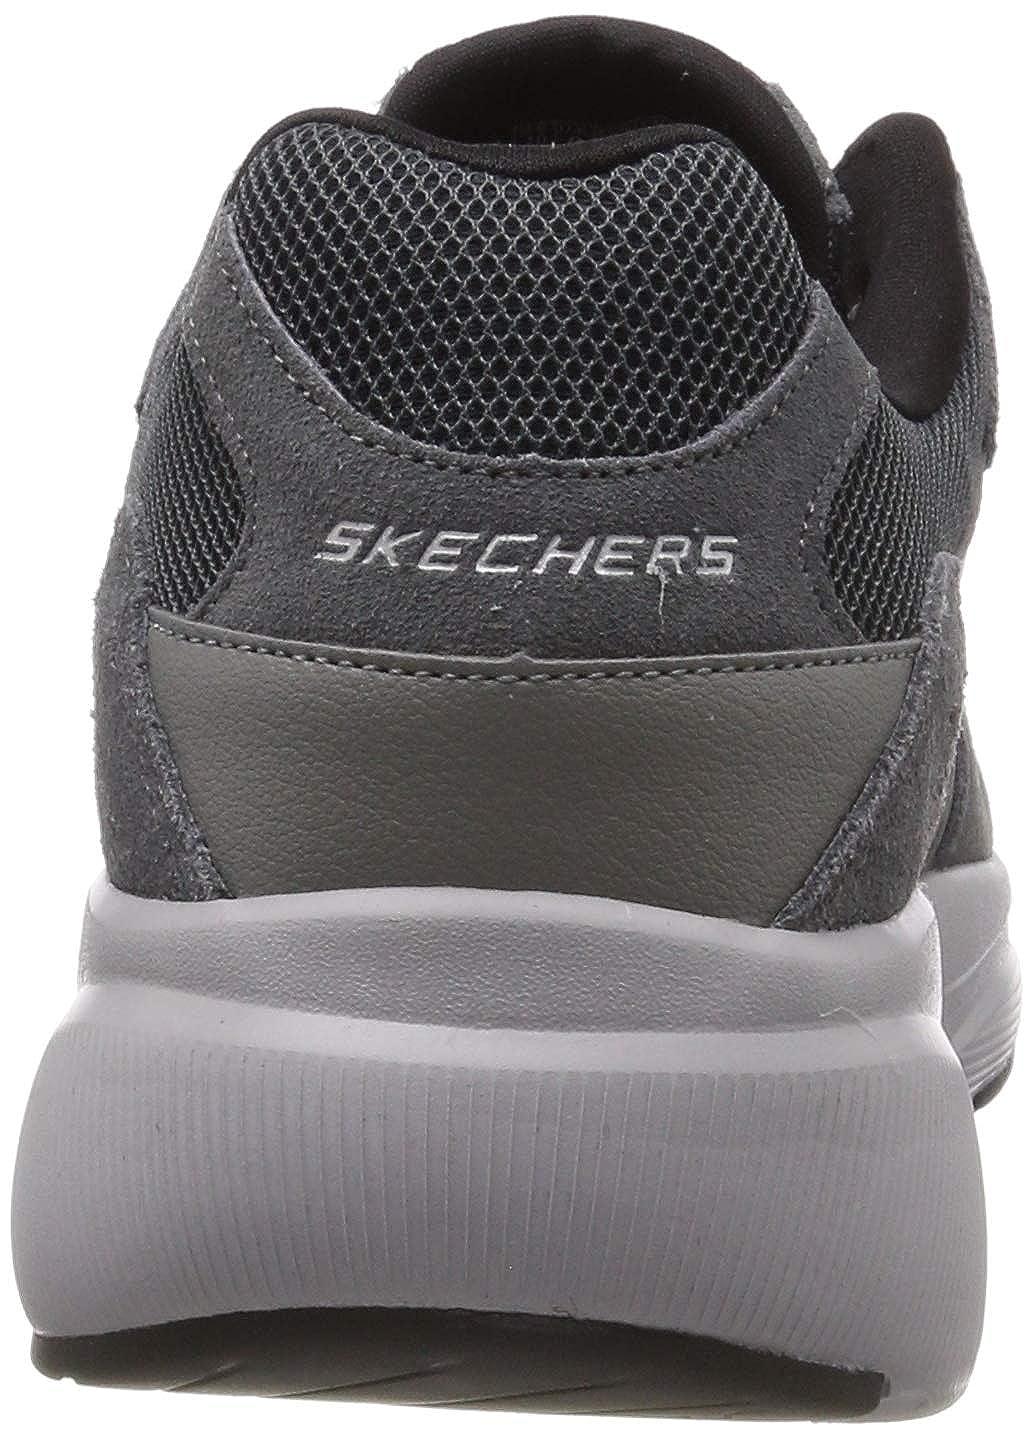 Skechers Herren Meridian-Ostwall Sneaker, braun, 39 EU Grau (Charcoal Grey Ccgy)